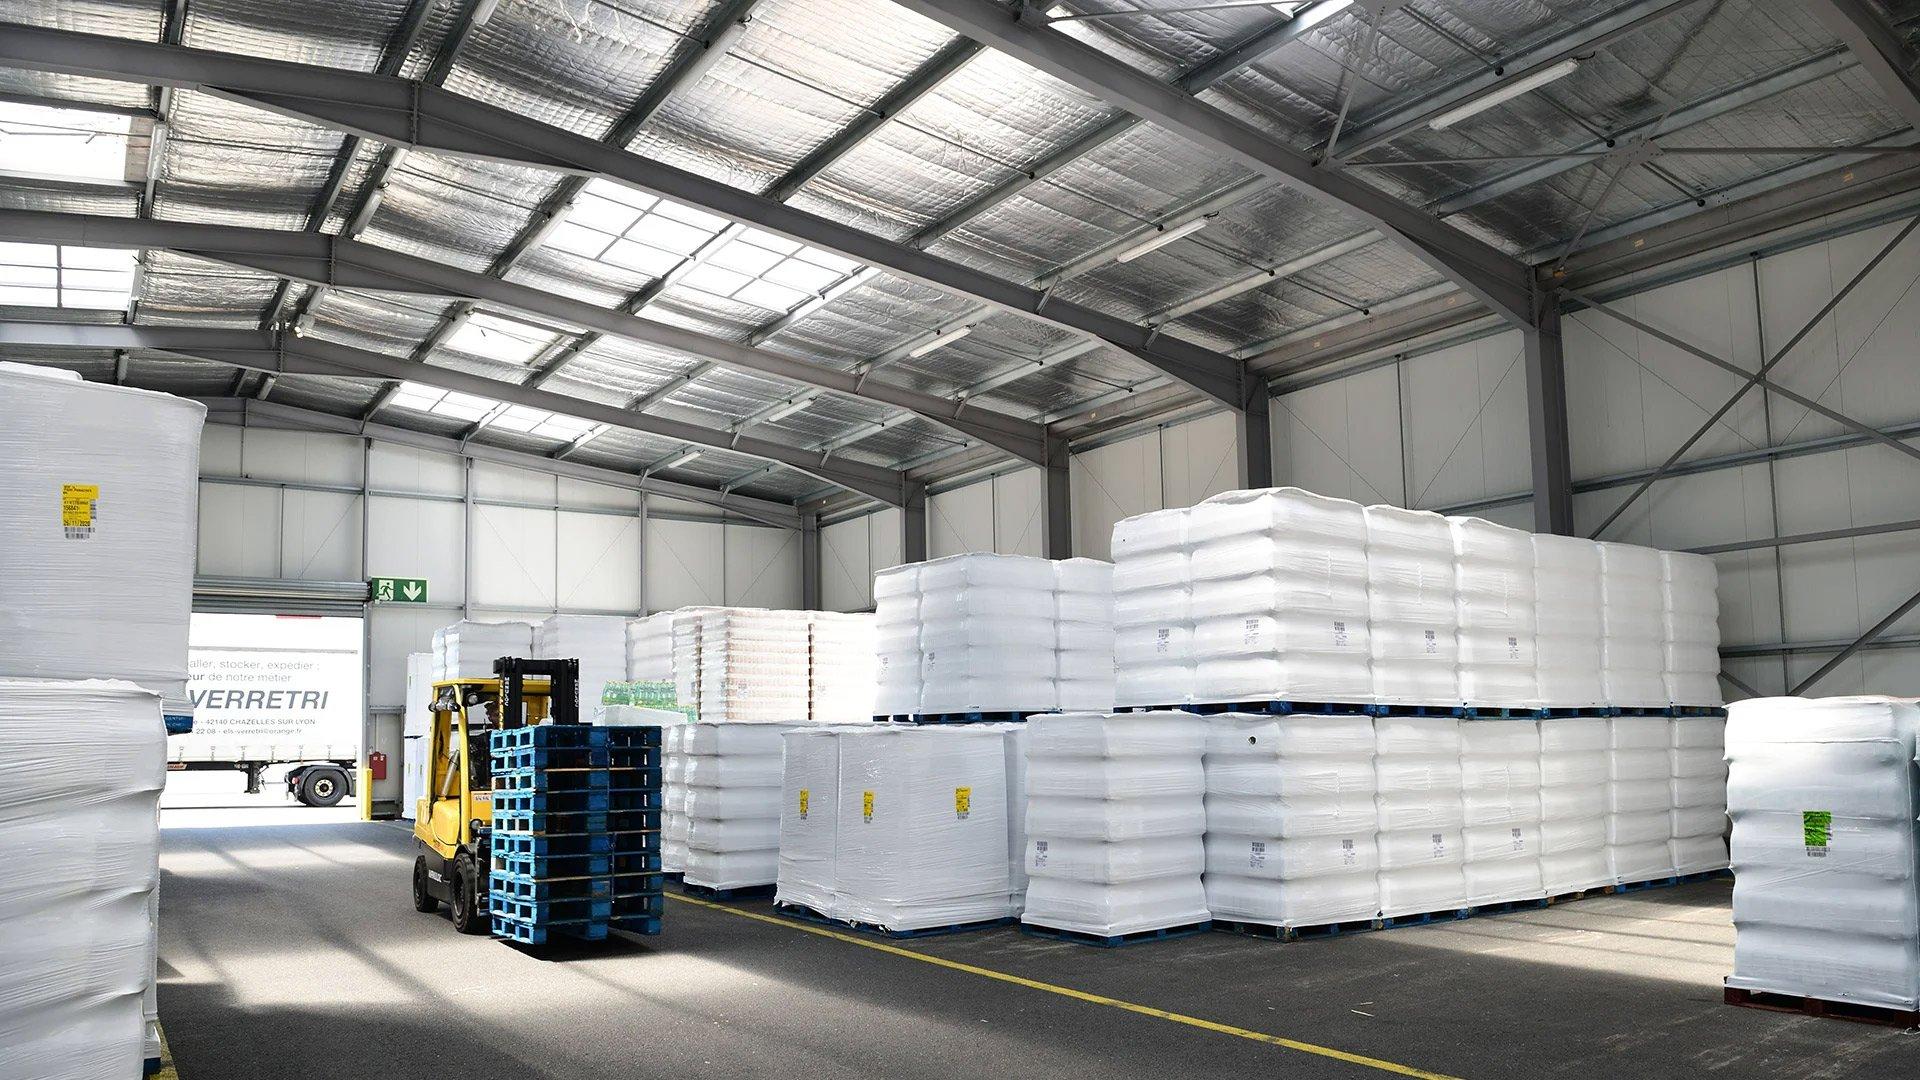 20200625_batiment-industriel-interieur-LOcabri-1